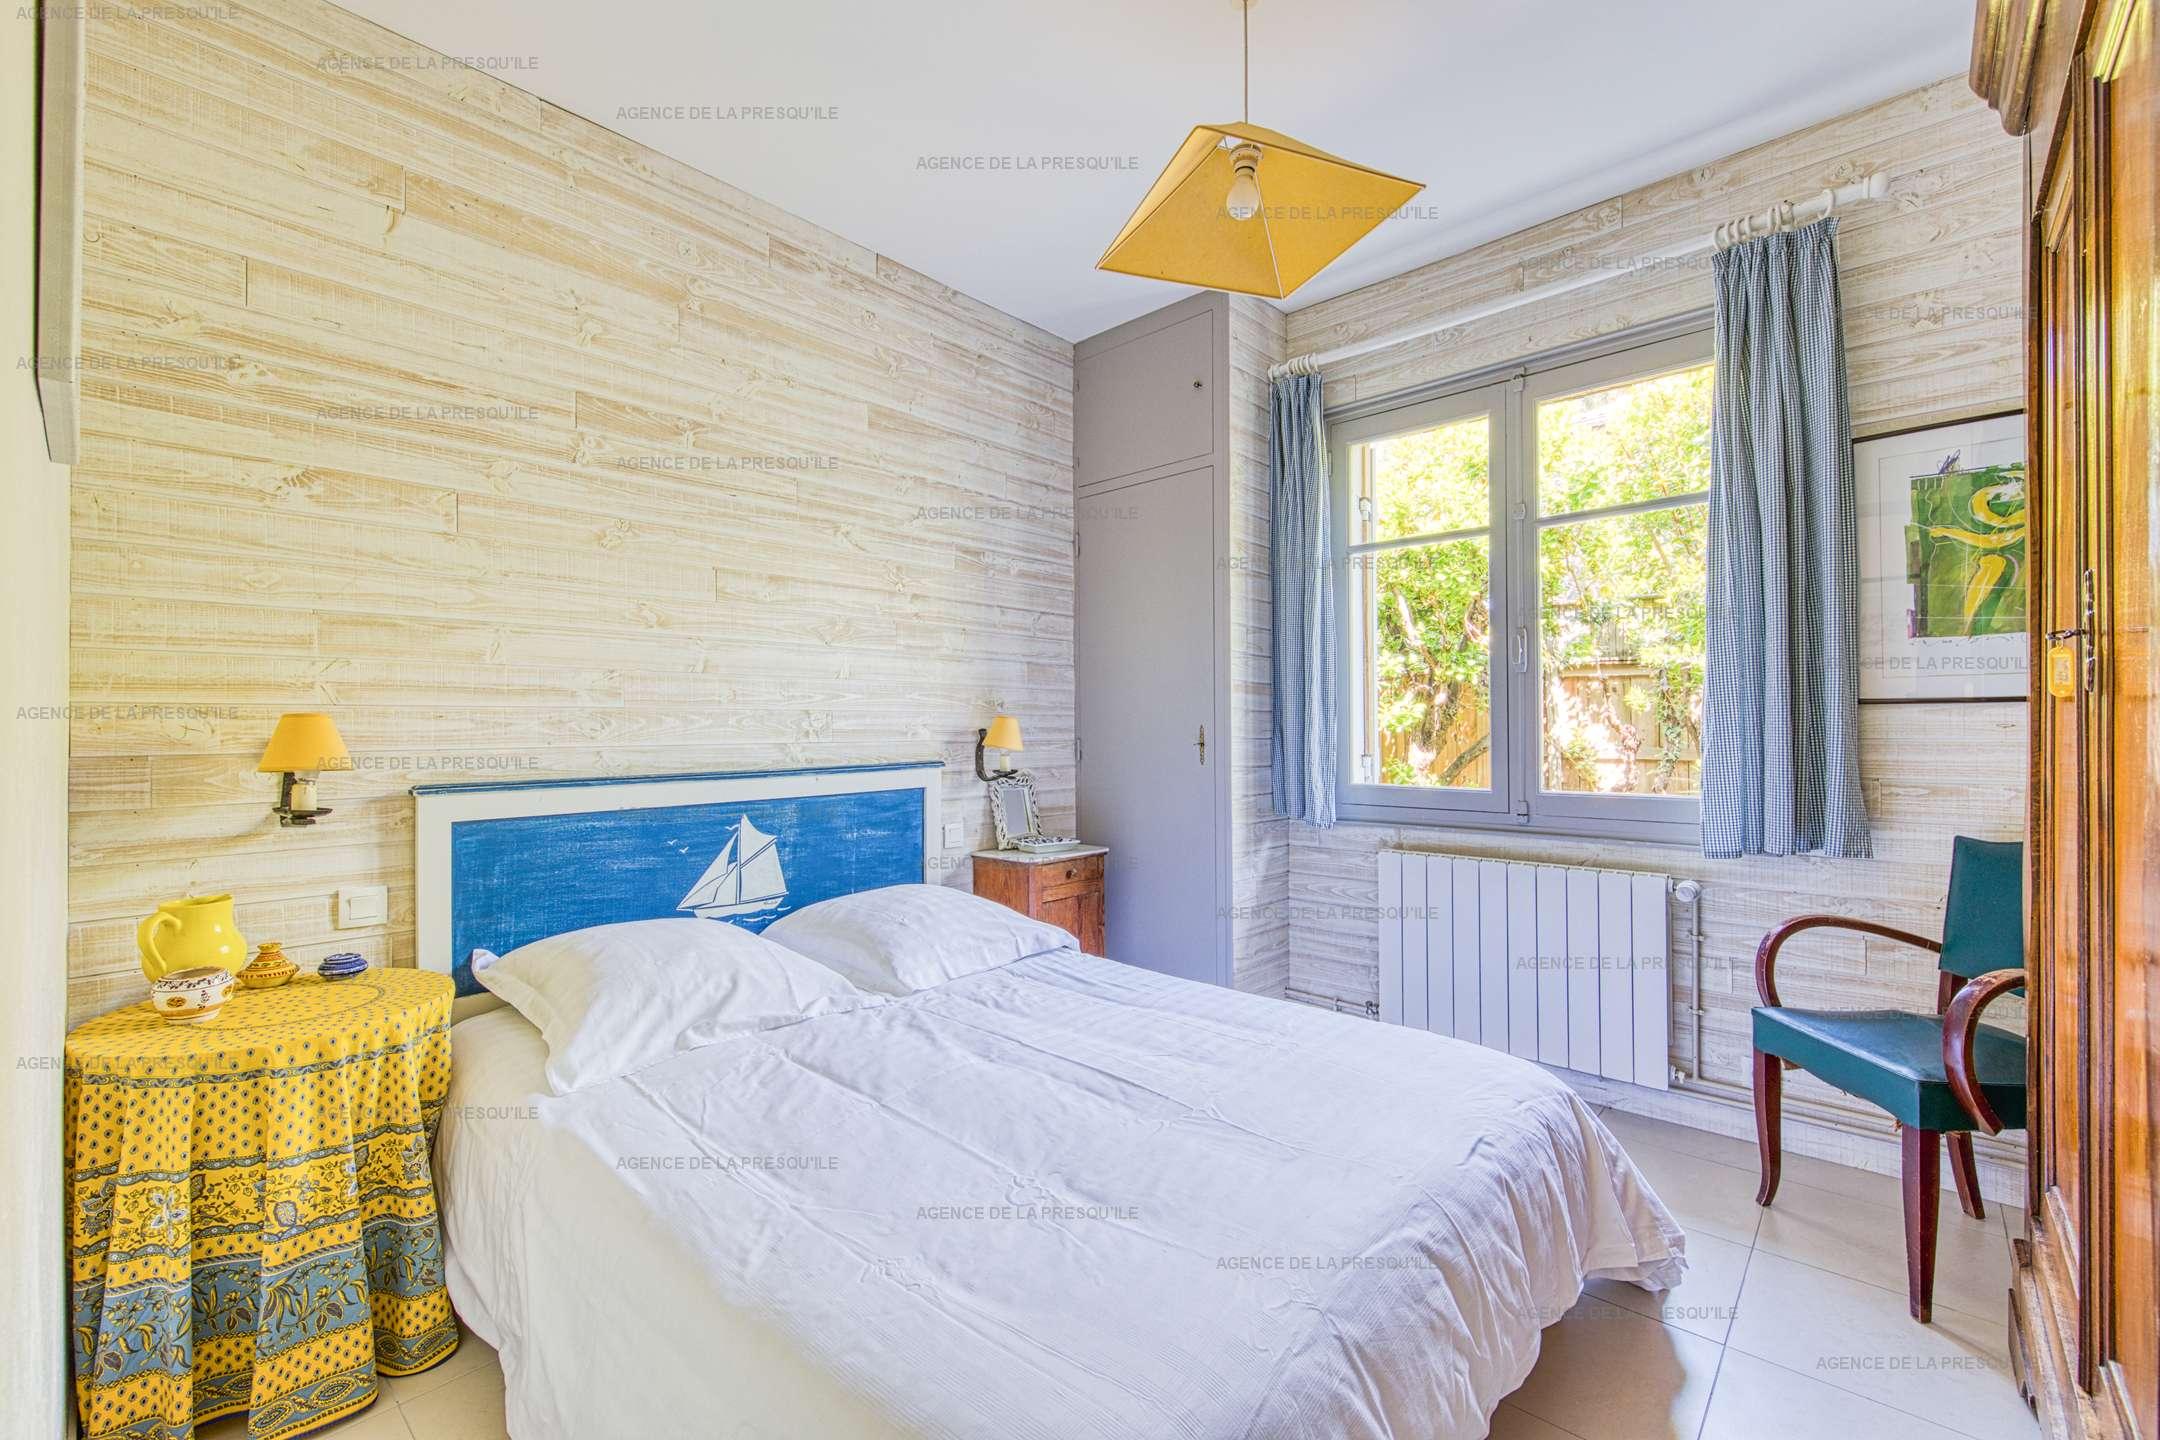 Location: Charmante villa avec piscine entre bassin et océan 10